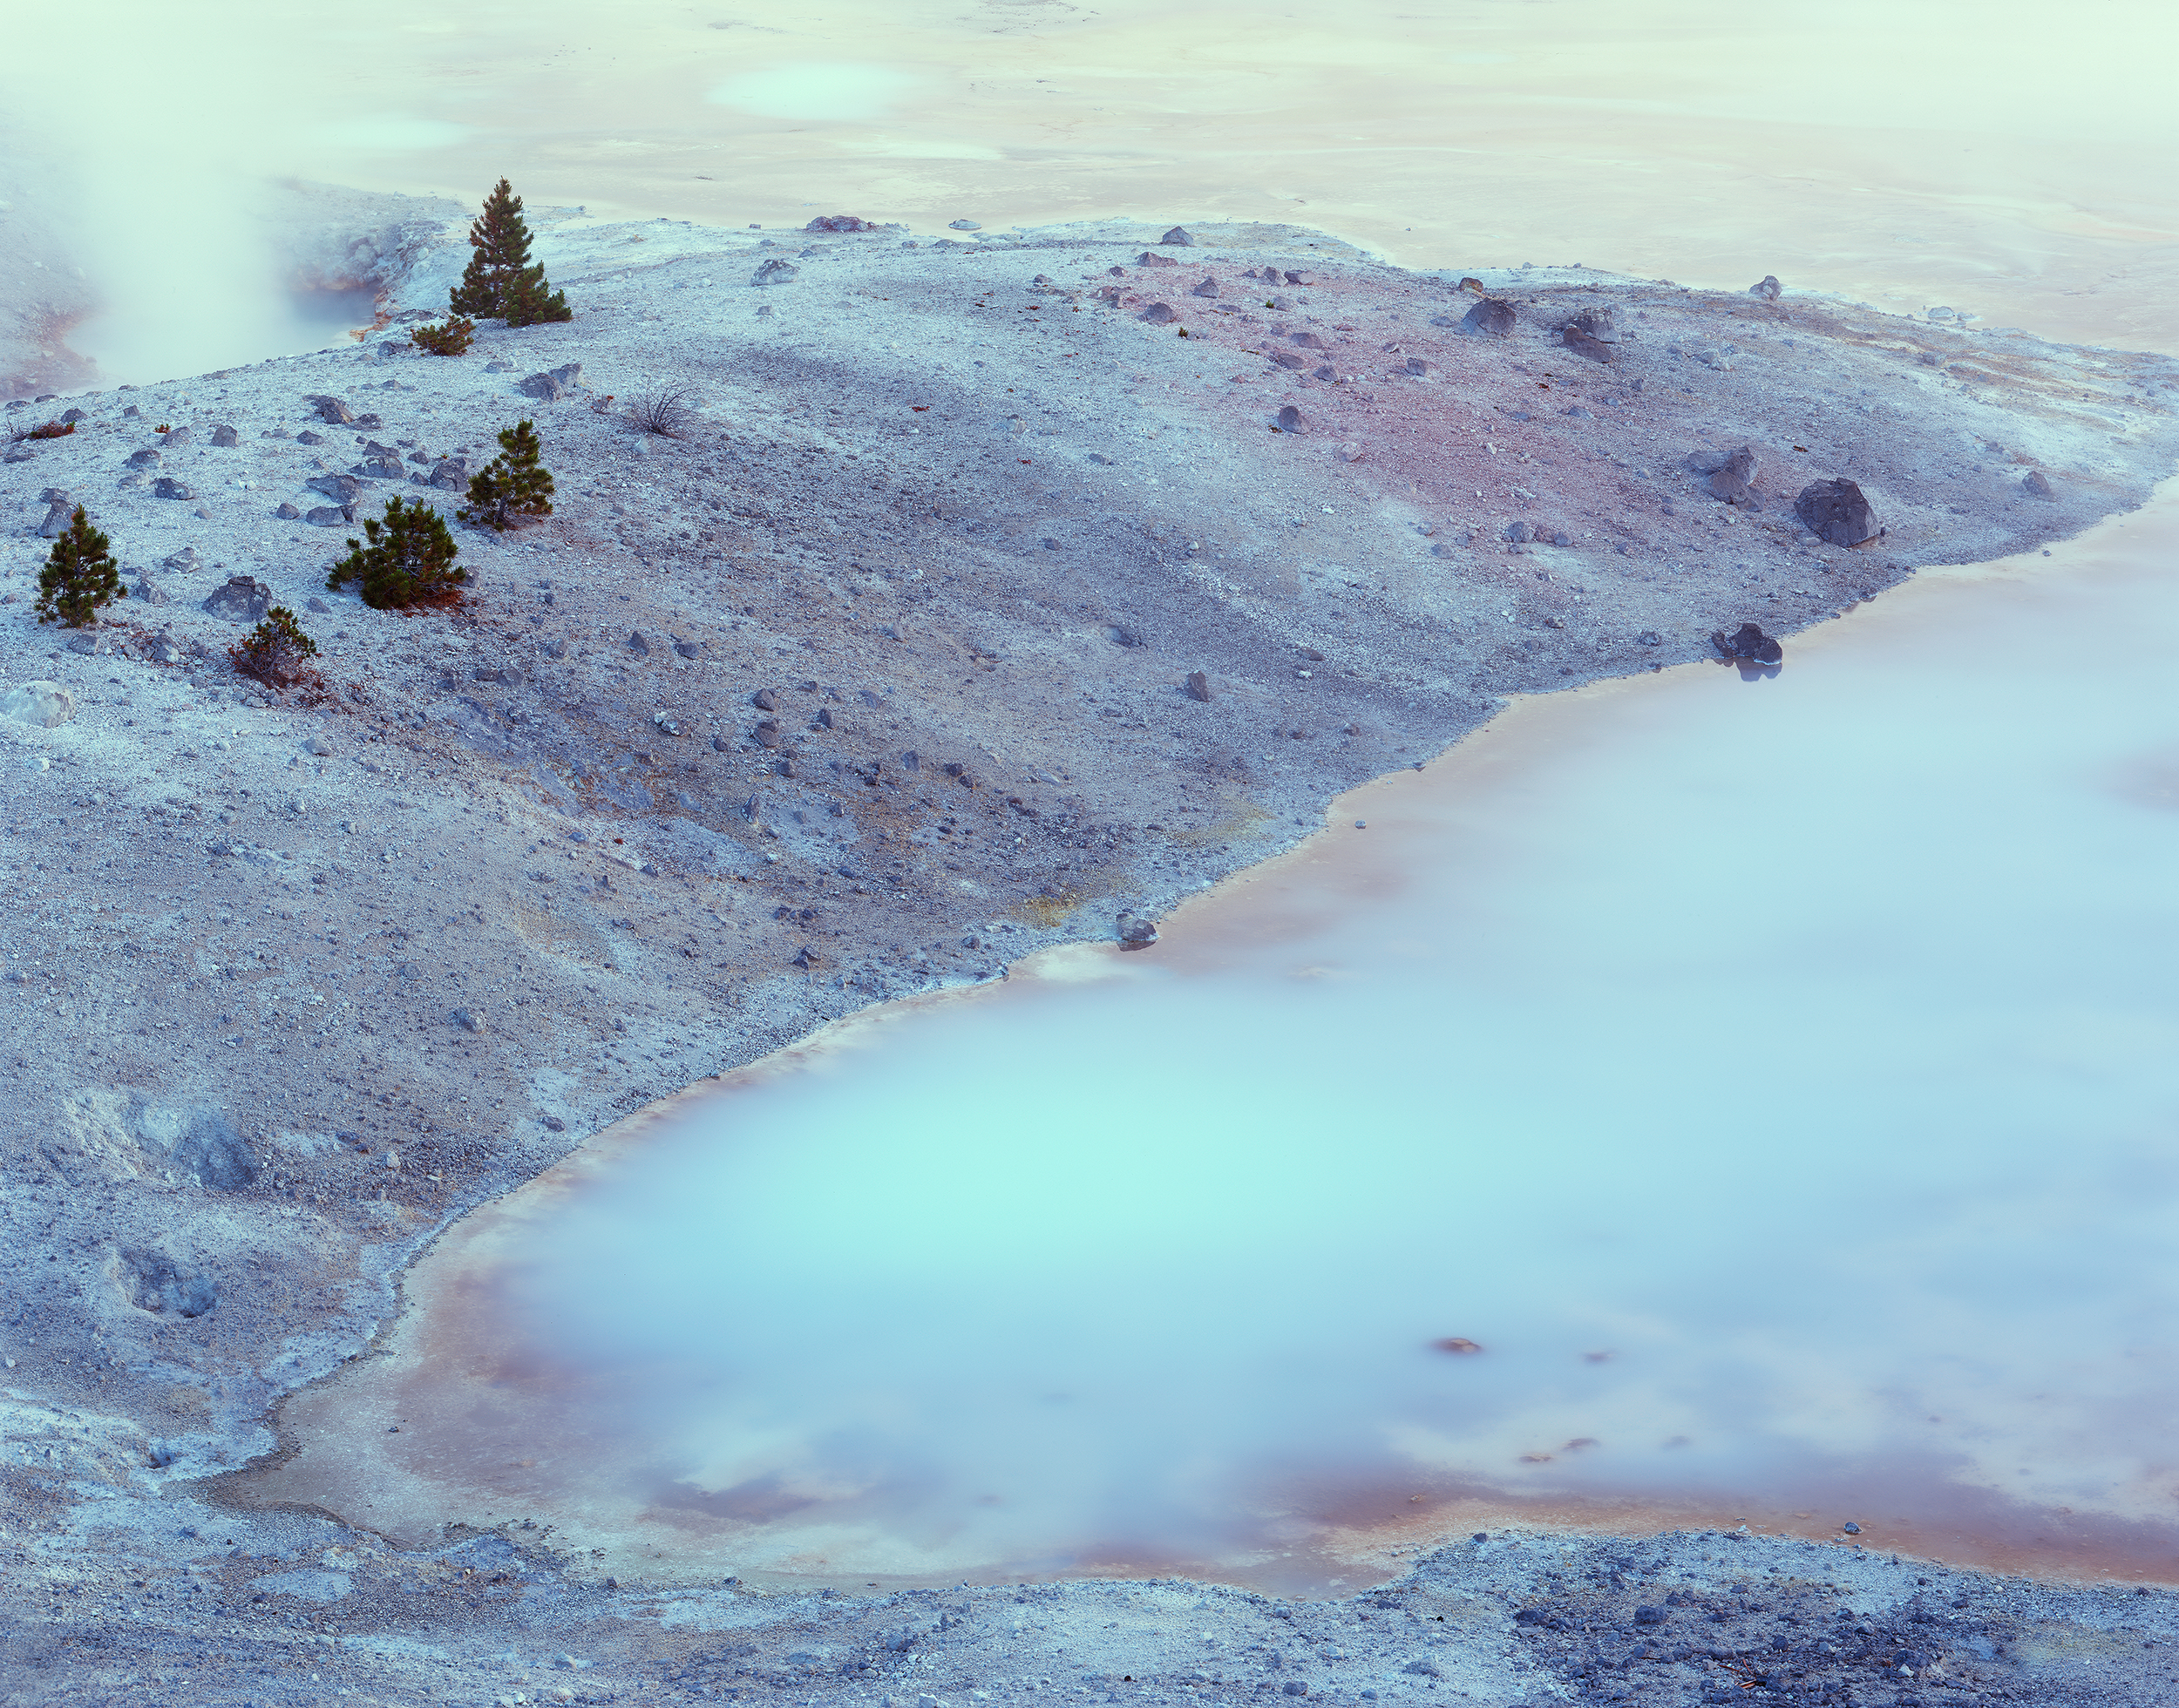 Jim Becia, Pastel Pool - Norris Geyser Basin